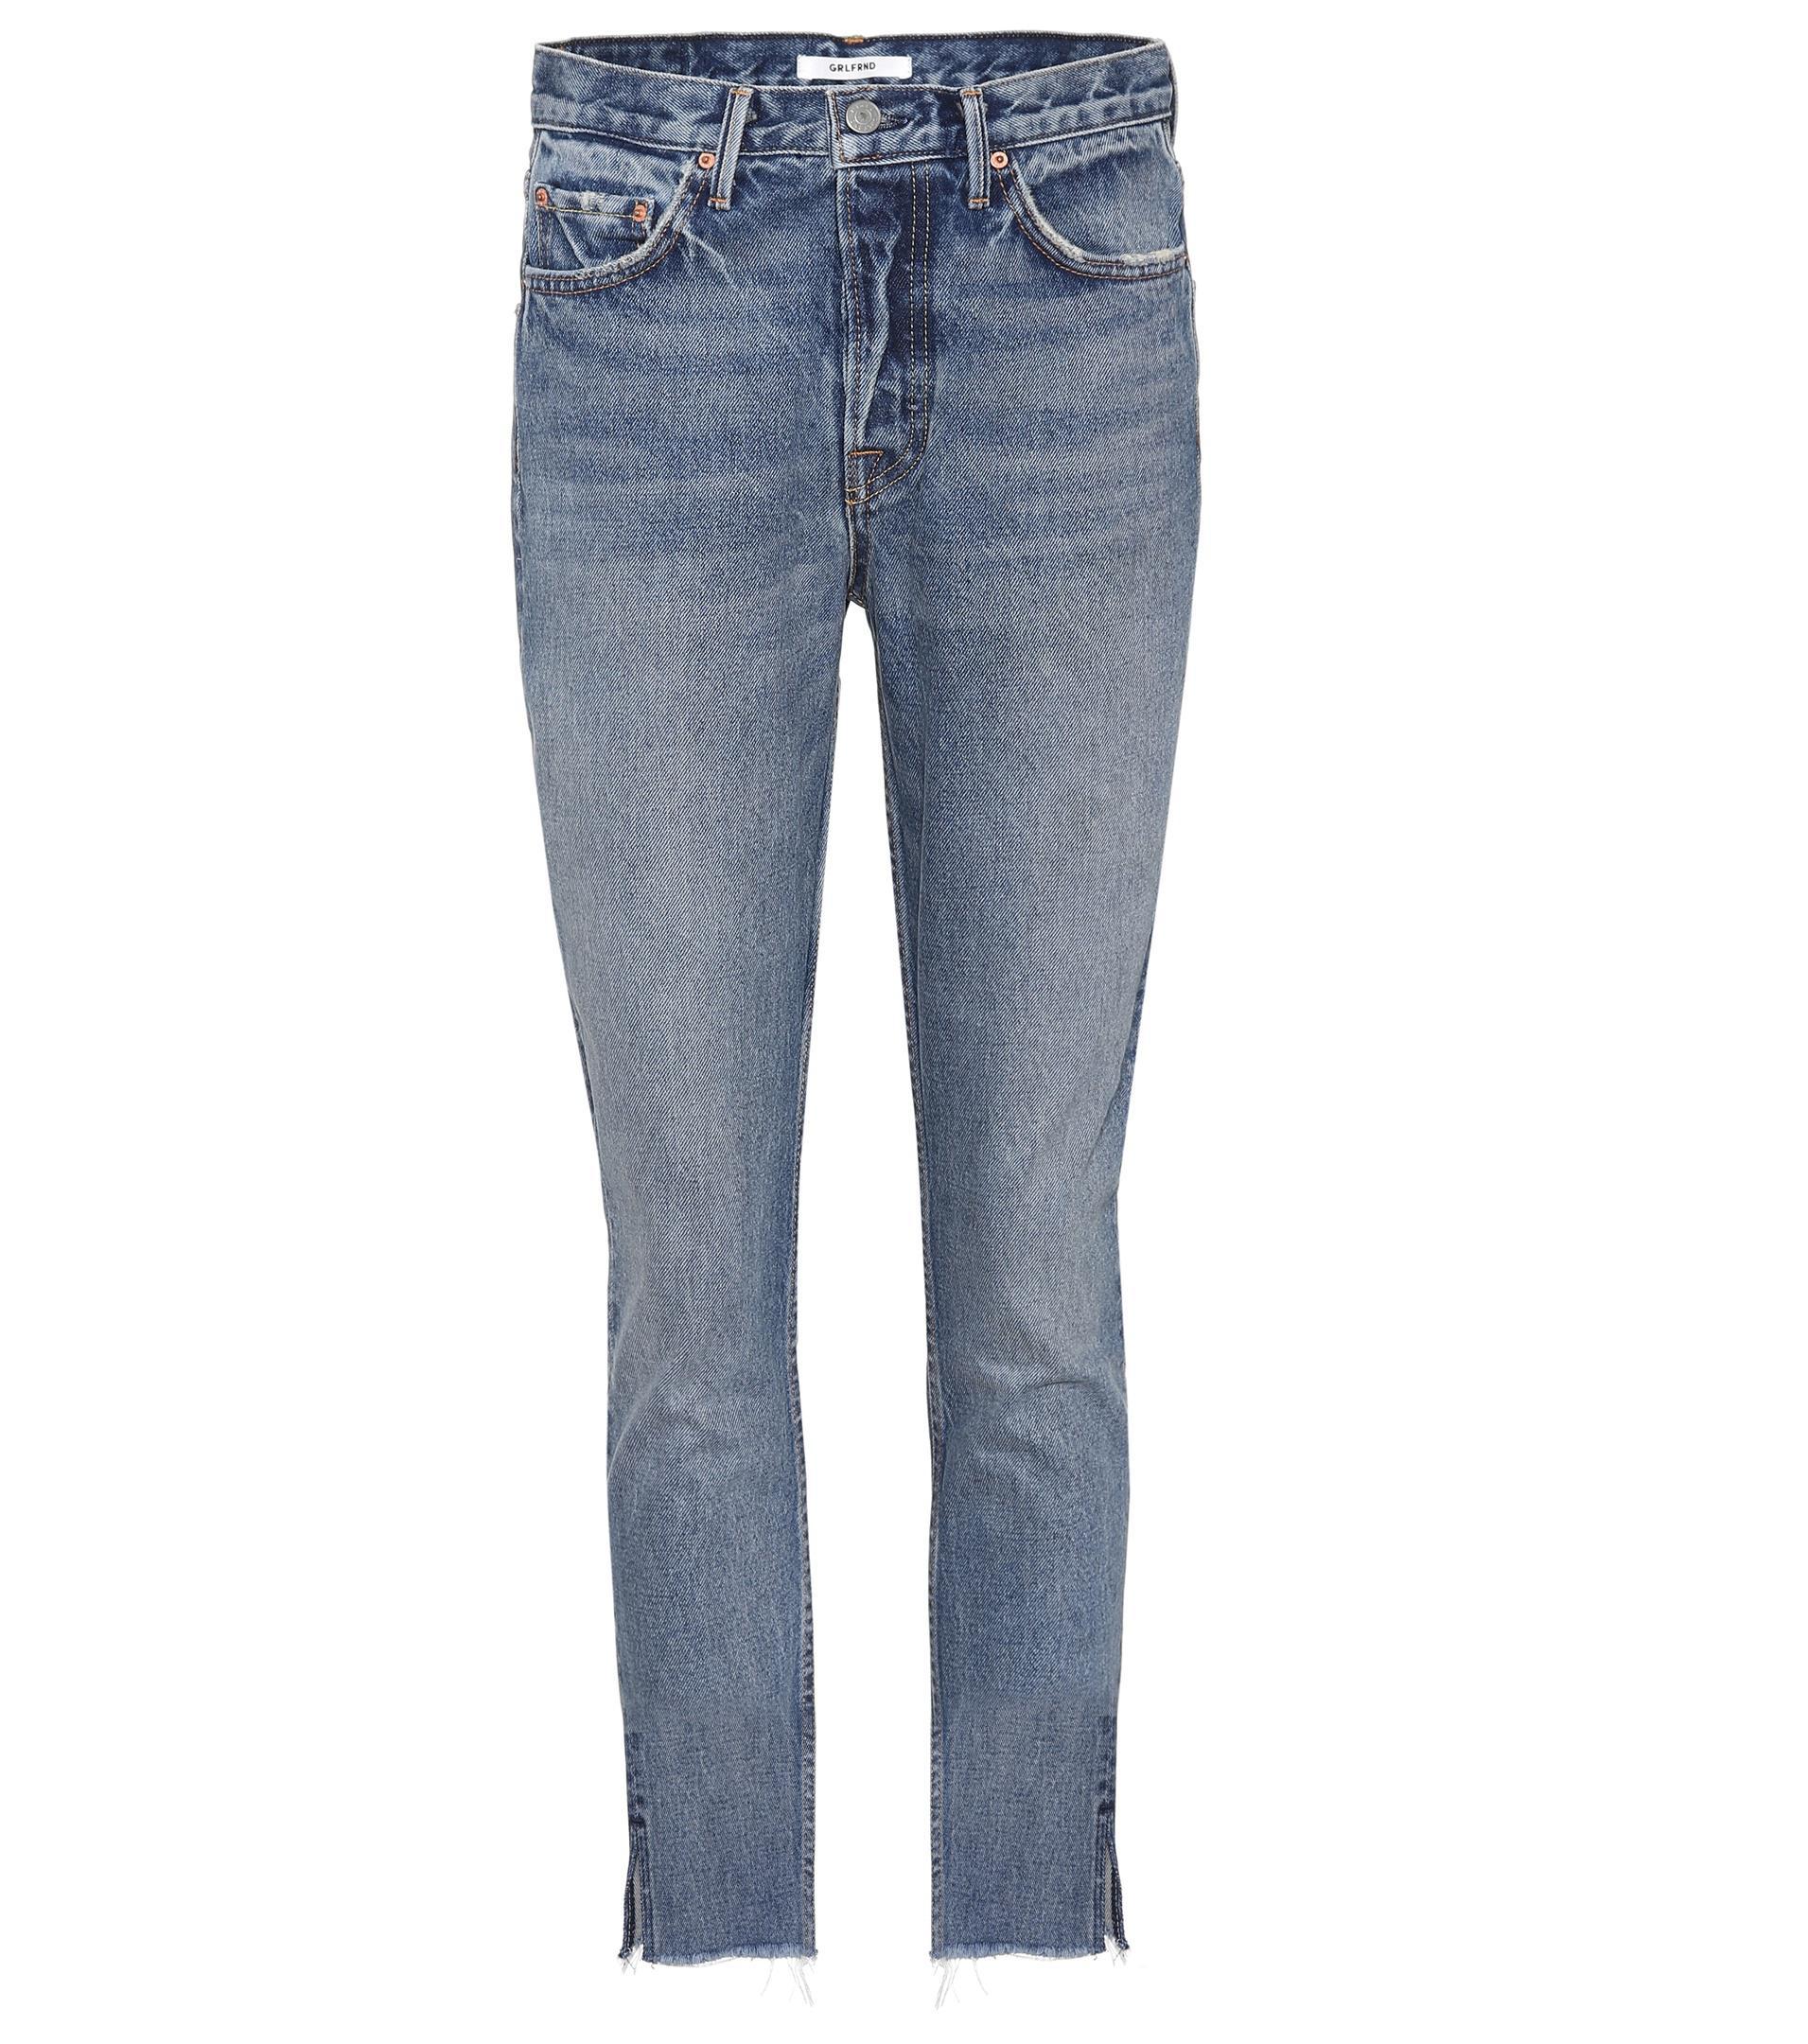 Discount Recommend Karolina cropped jeans - Blue GRLFRND Best Seller Cheap Online QH85tQn2